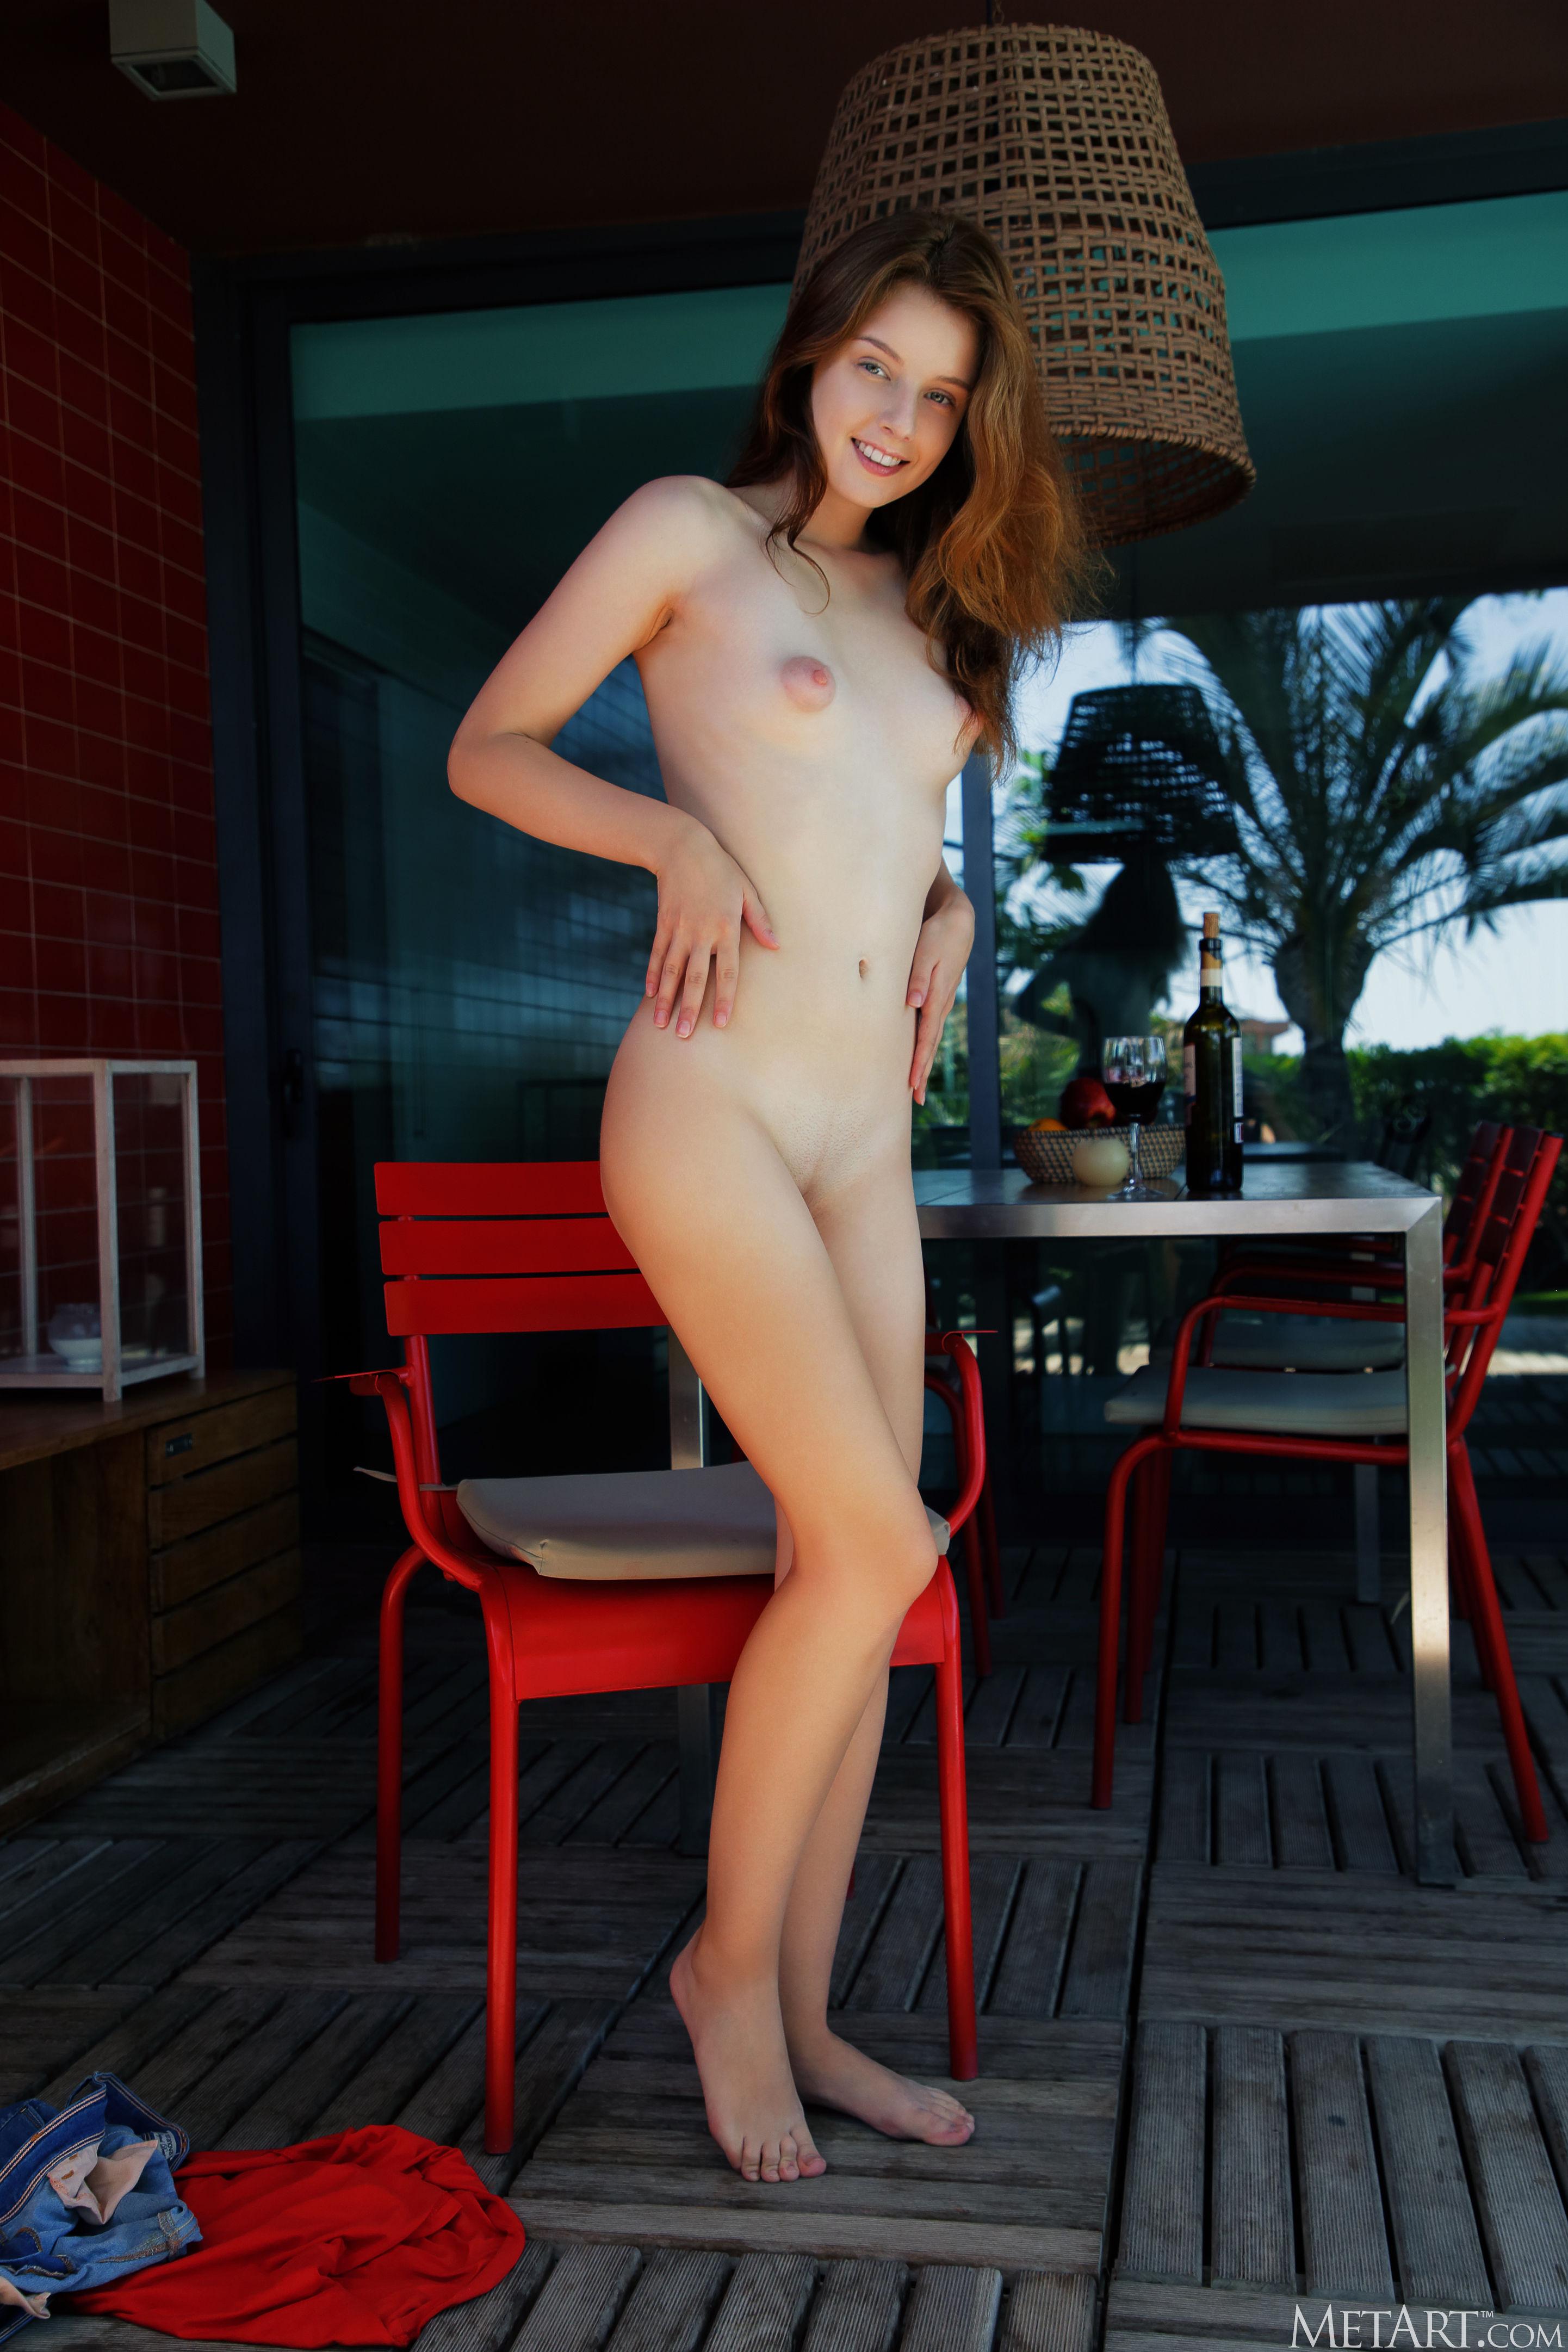 Met Art Patio Chair Sienna high 0091